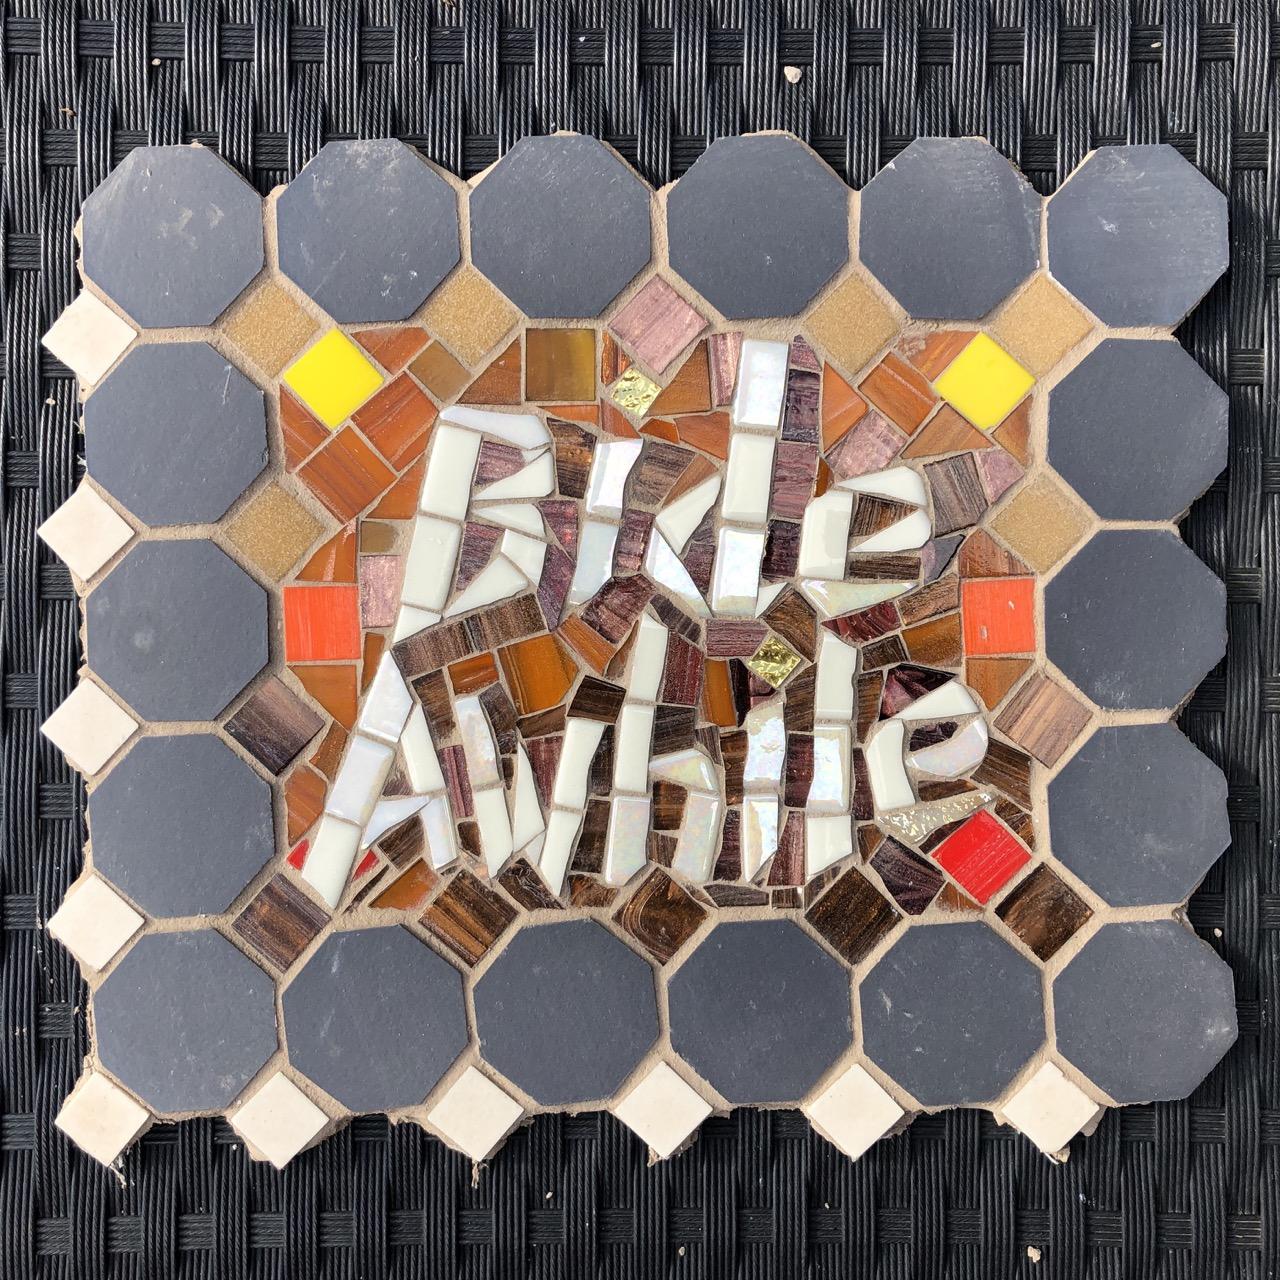 mosaic_letters.jpg